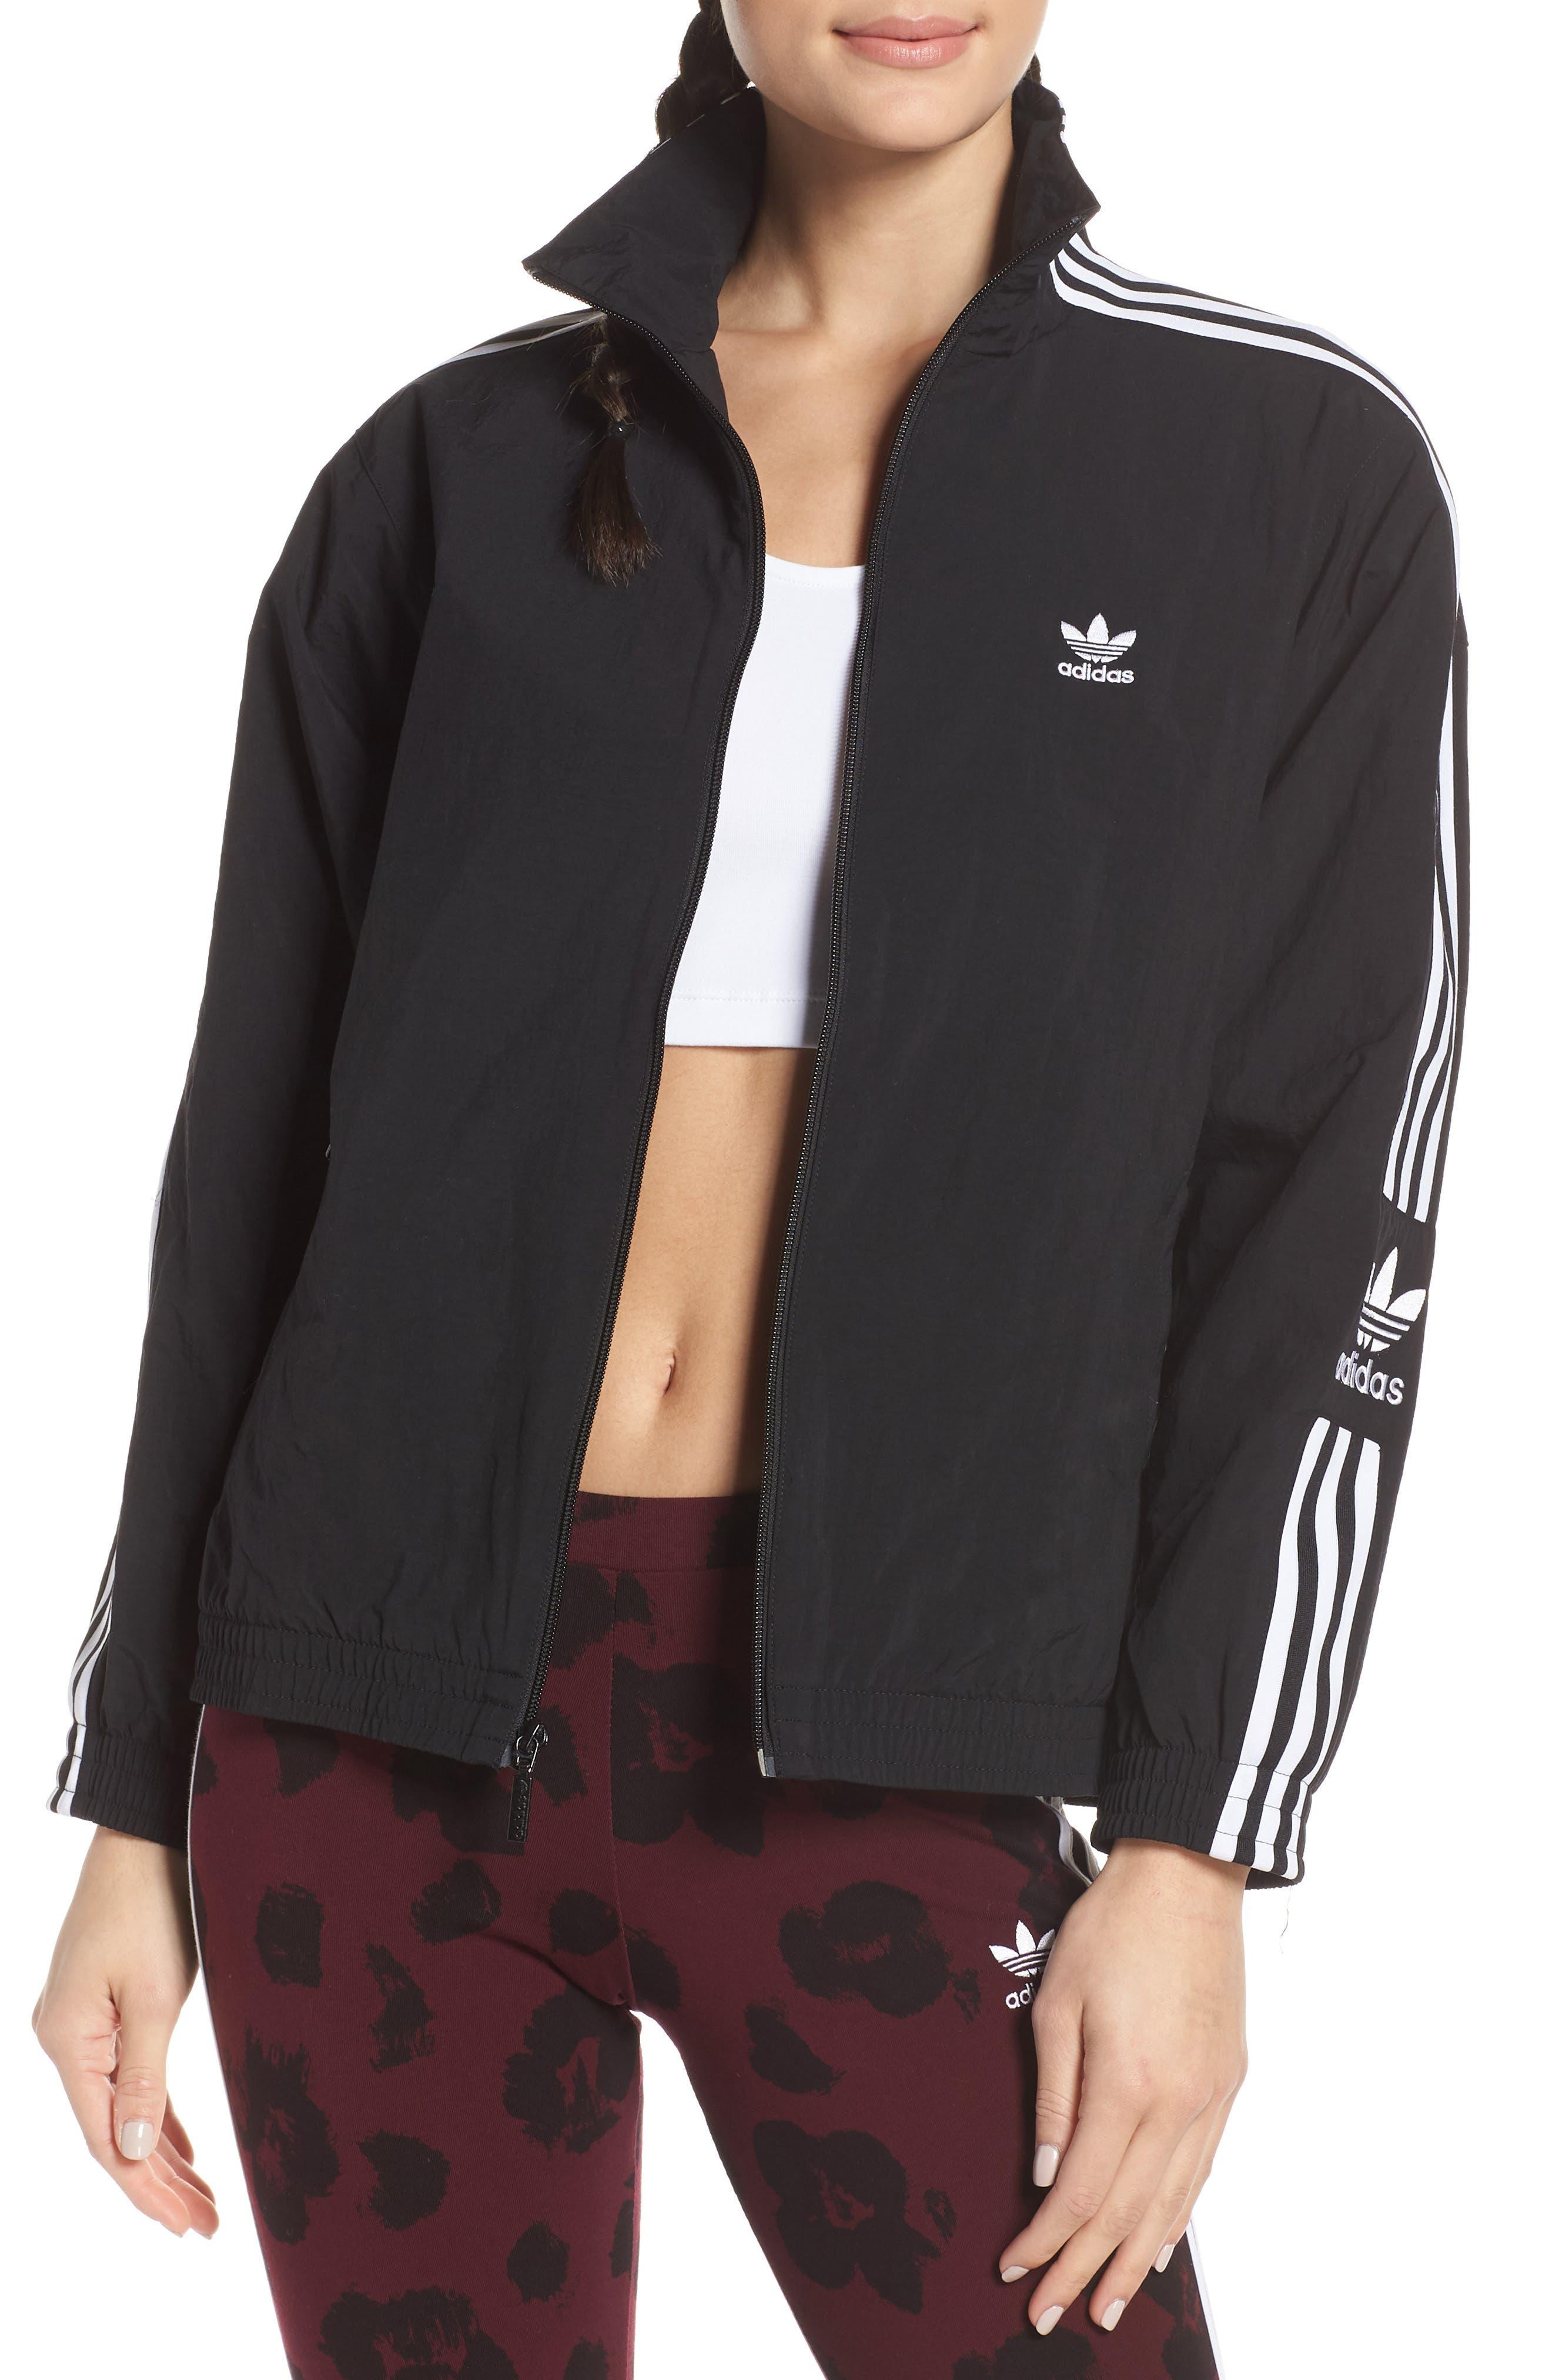 Women's Adidas Originals Performance Jackets & Coats   Nordstrom